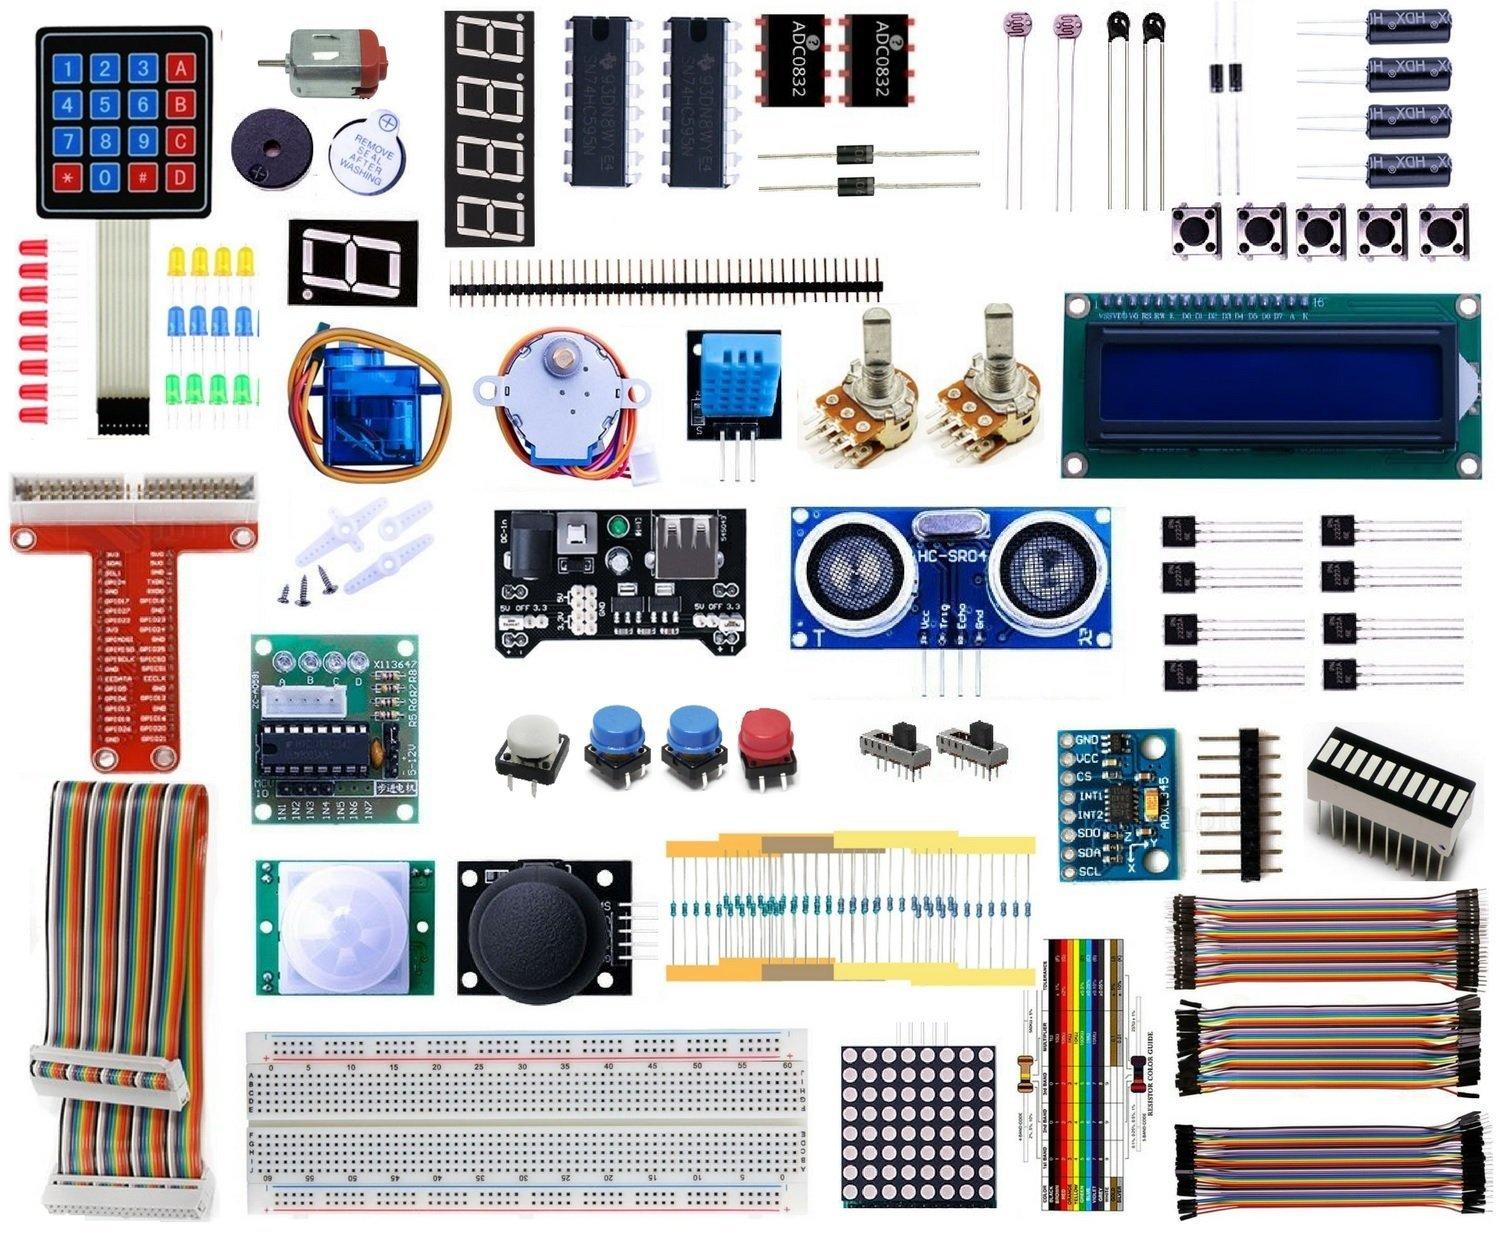 Computer Hardware - Basic   The WanTricks.com